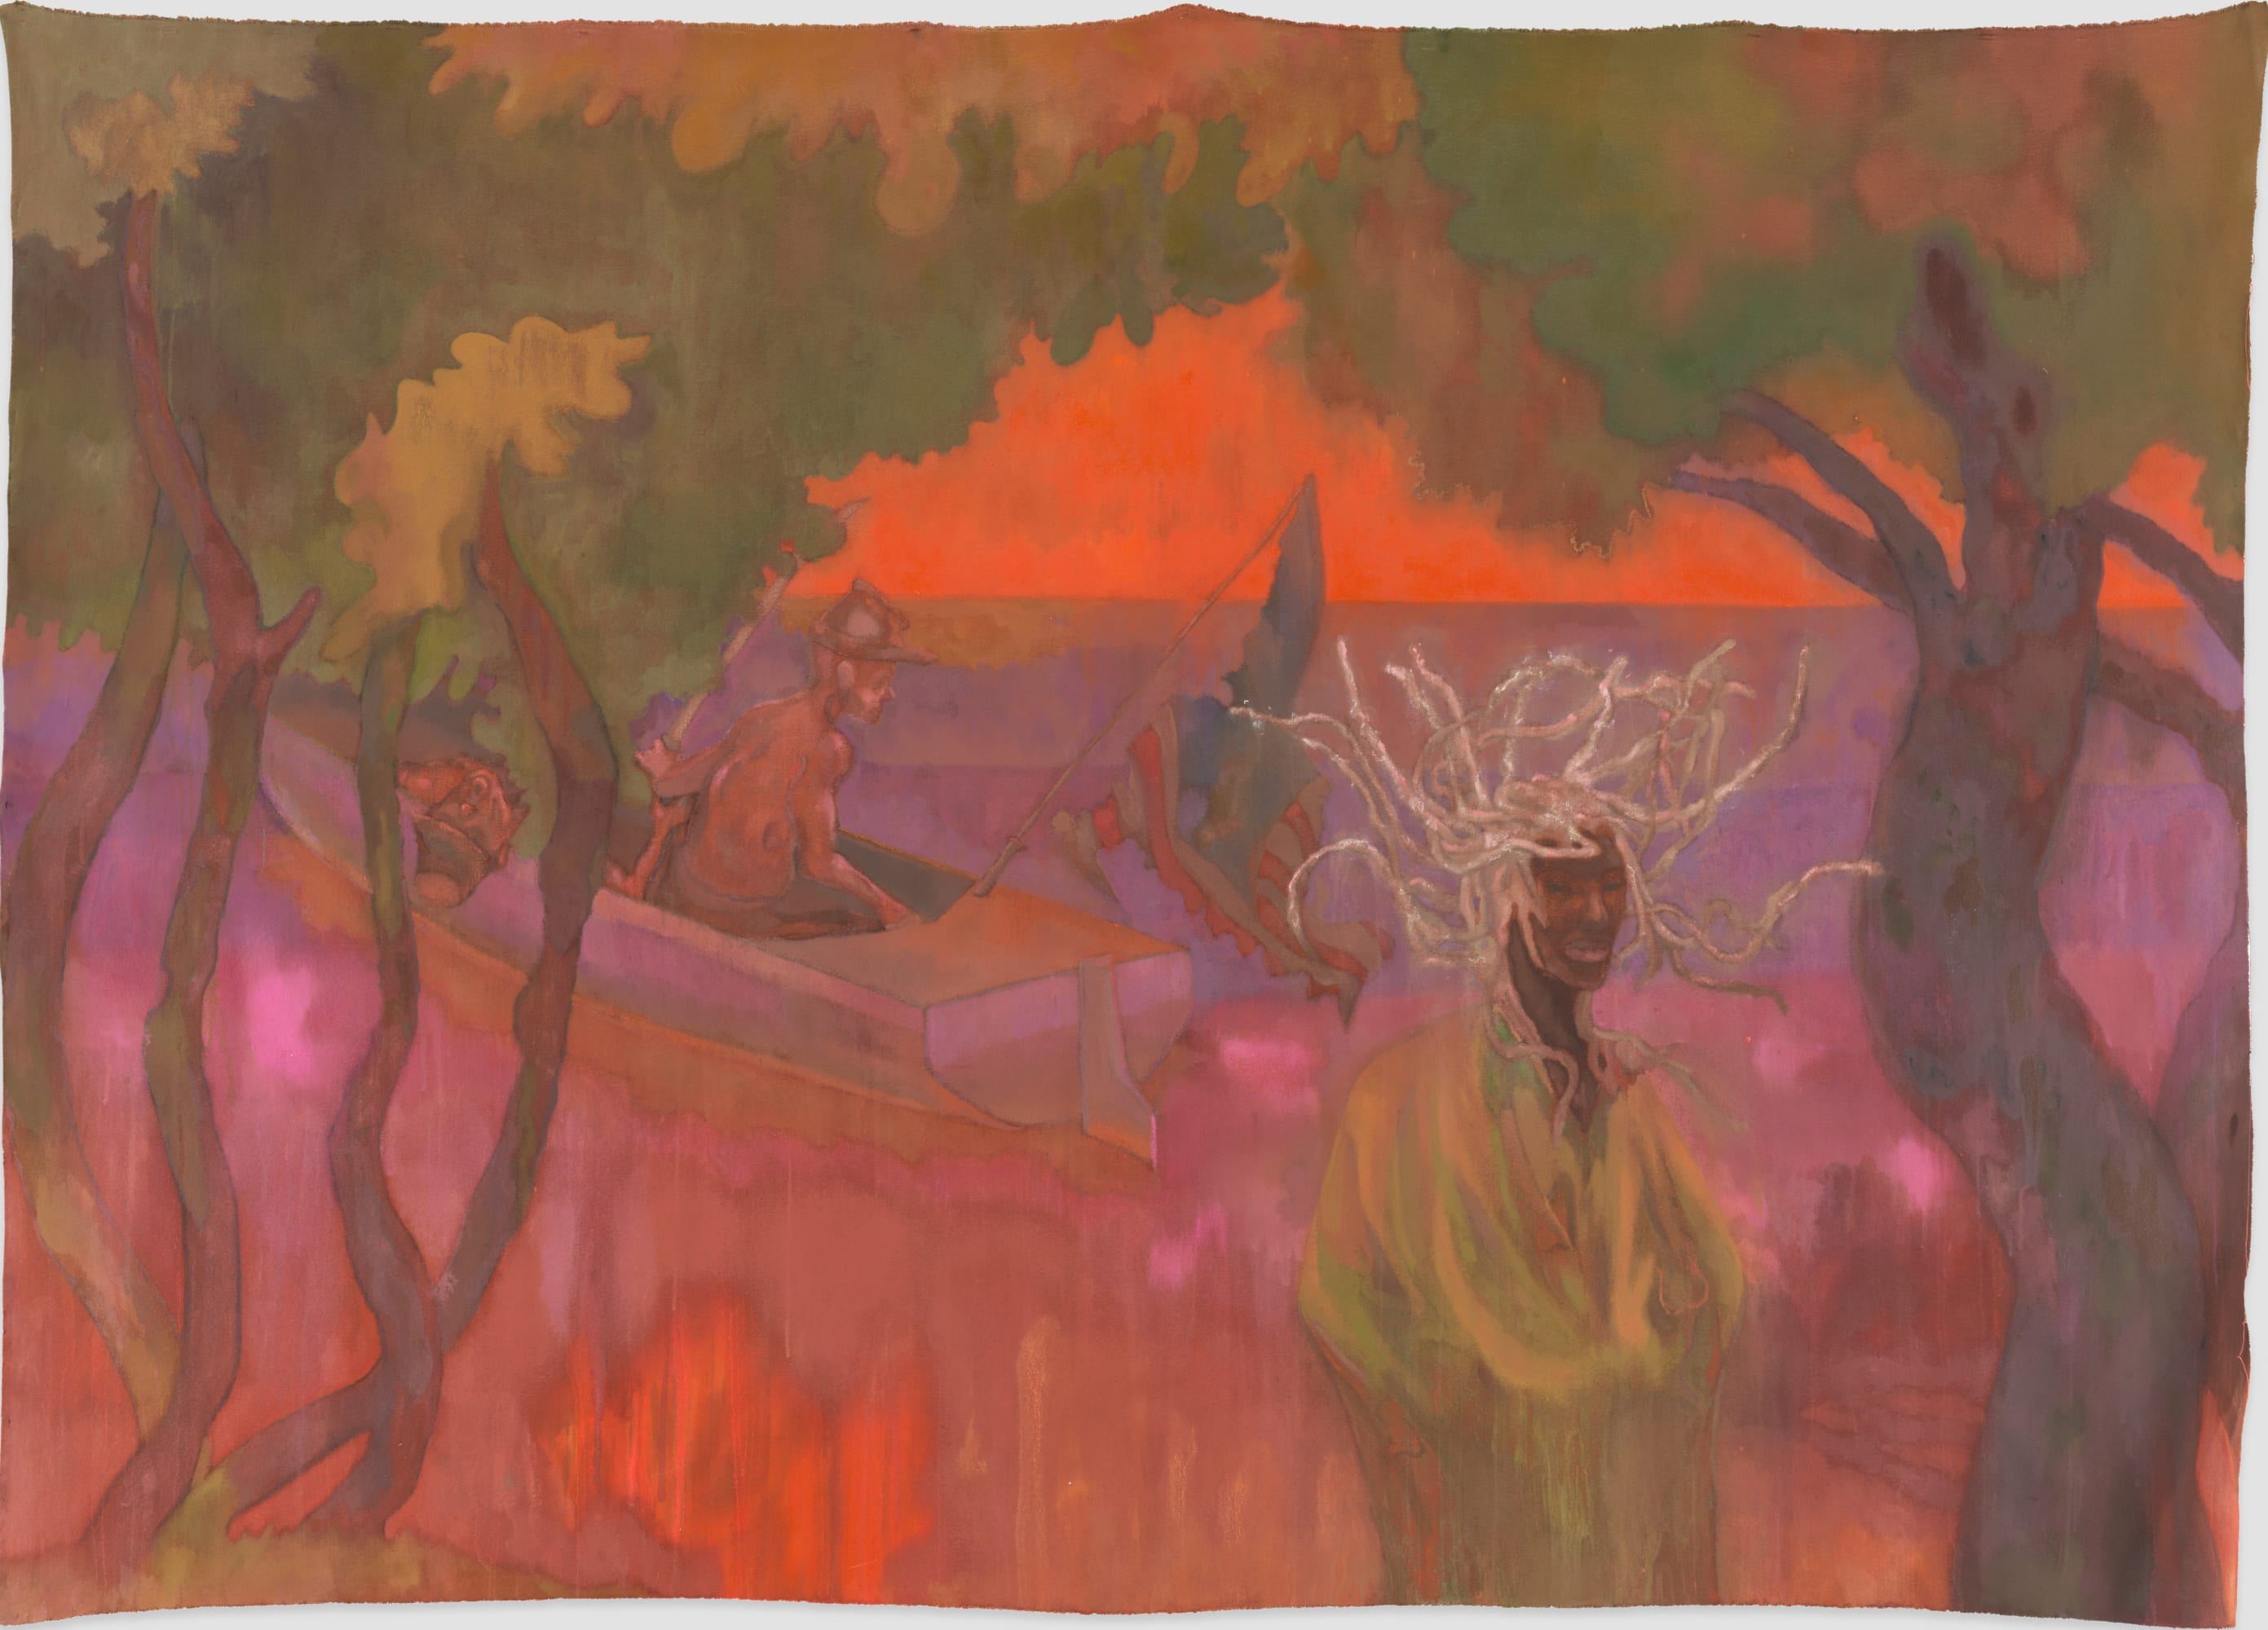 Sedrick Chisom Twenty Thousand Years of Fire and Snow